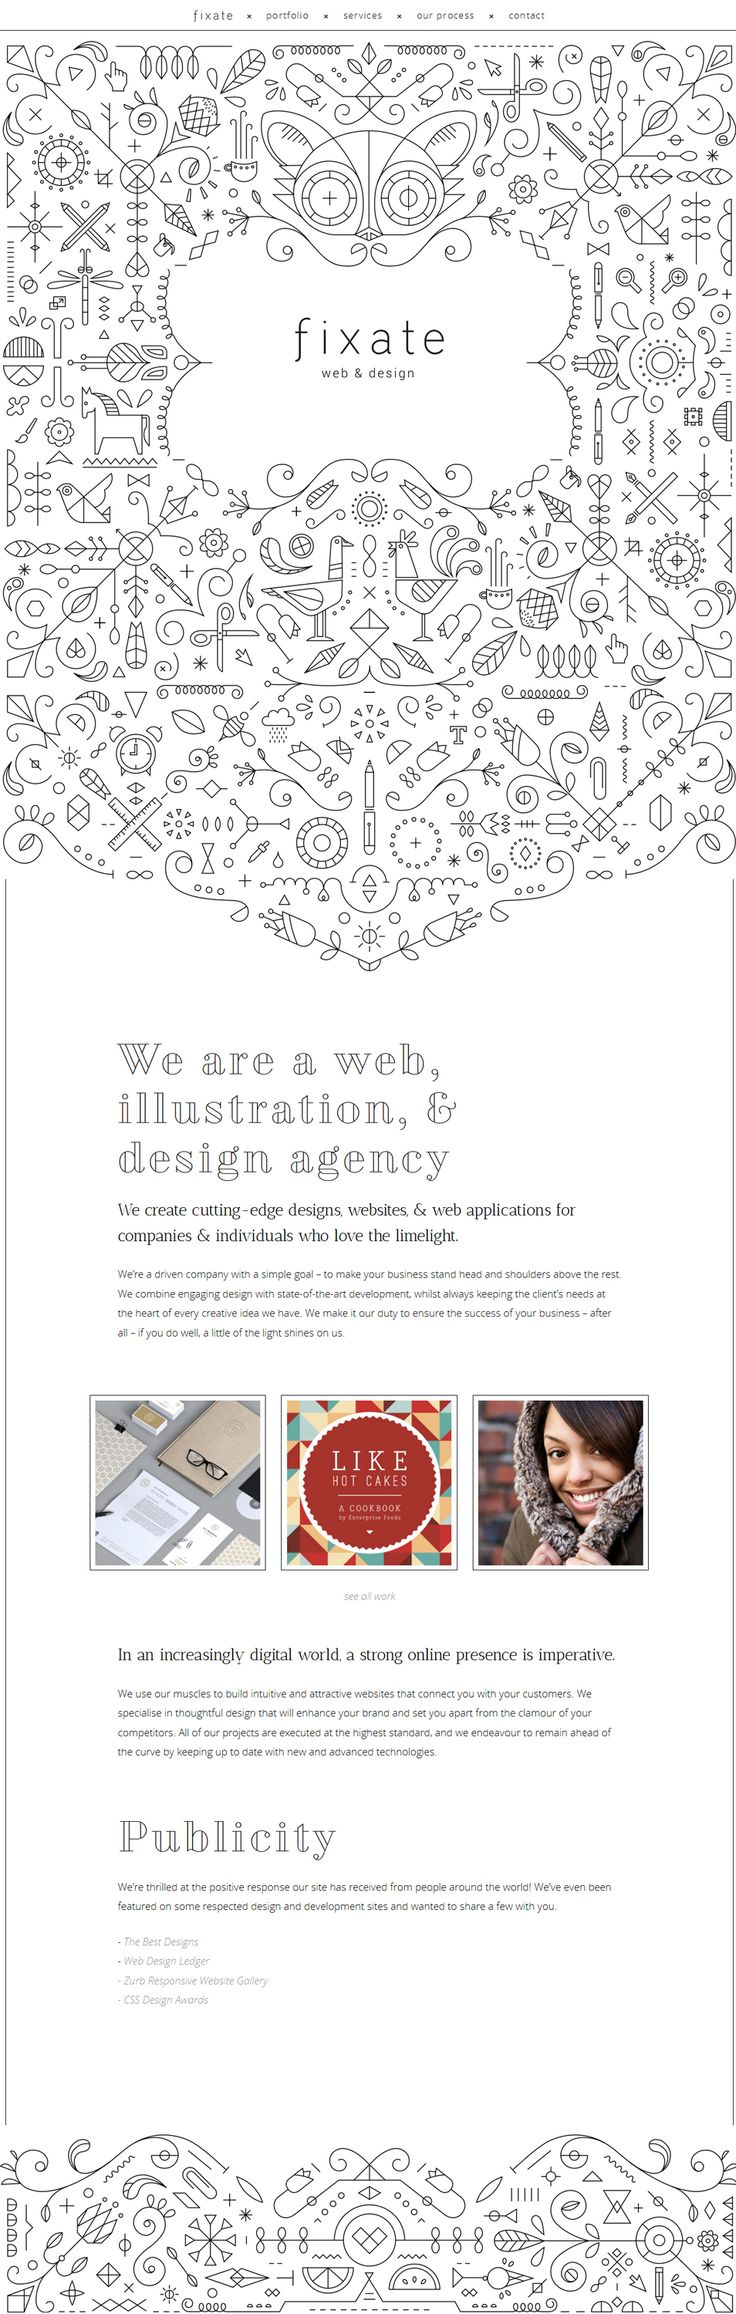 ~ fixate x web & design ~